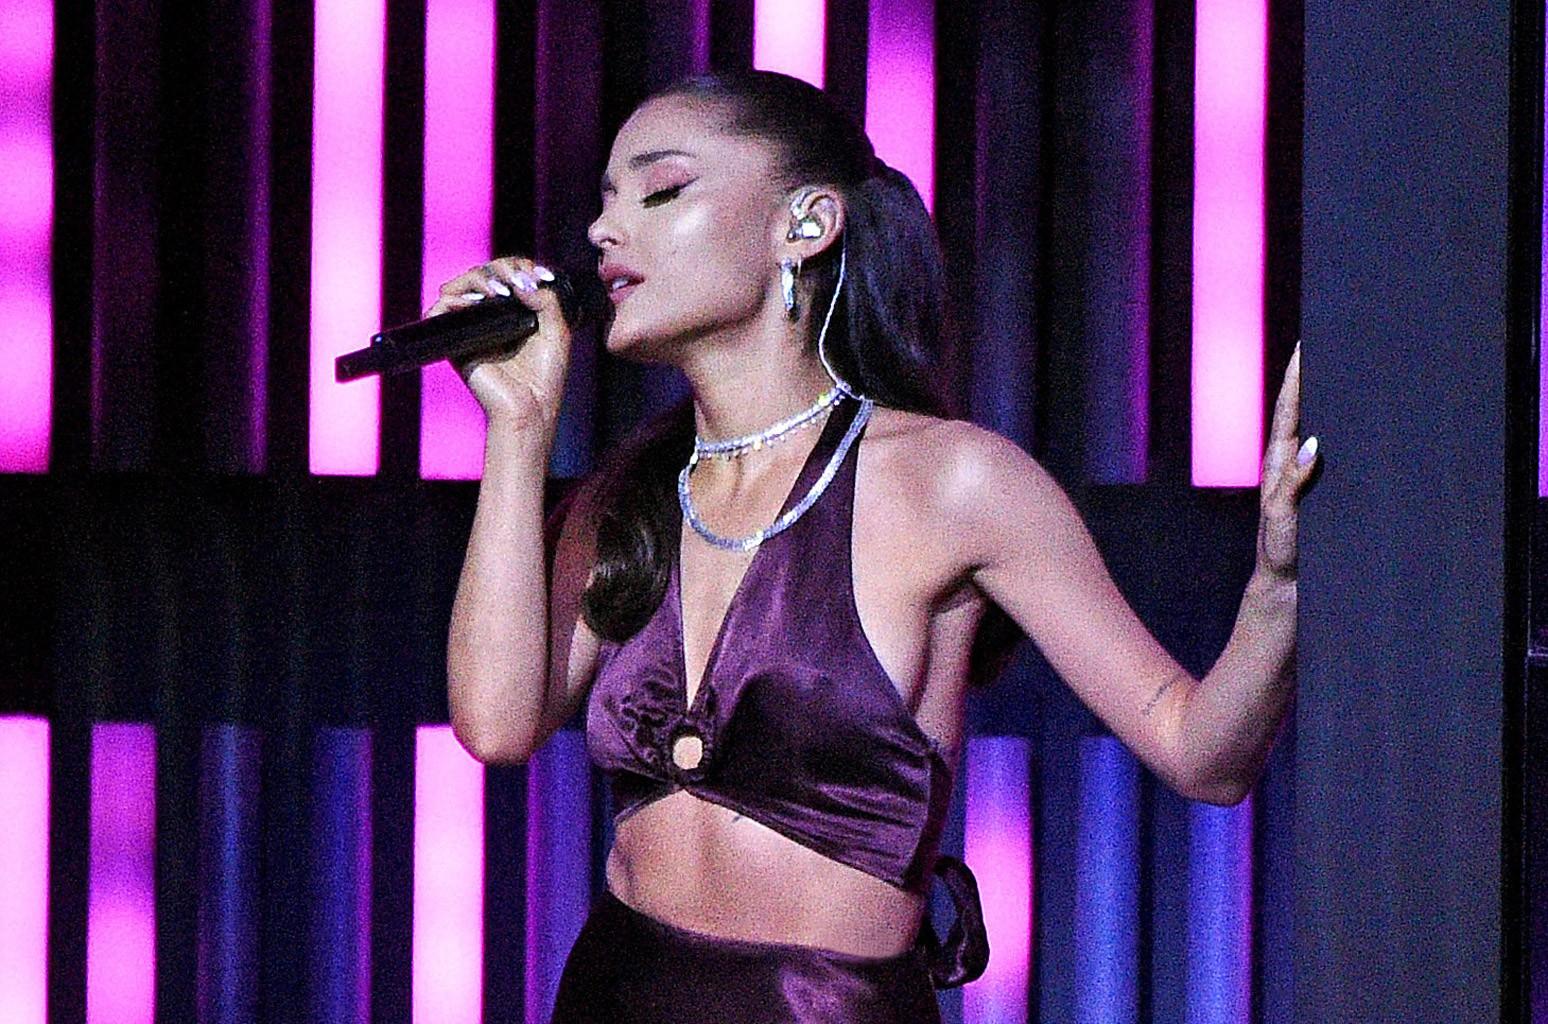 Tik Tok Viral Songs By Arianna Grande